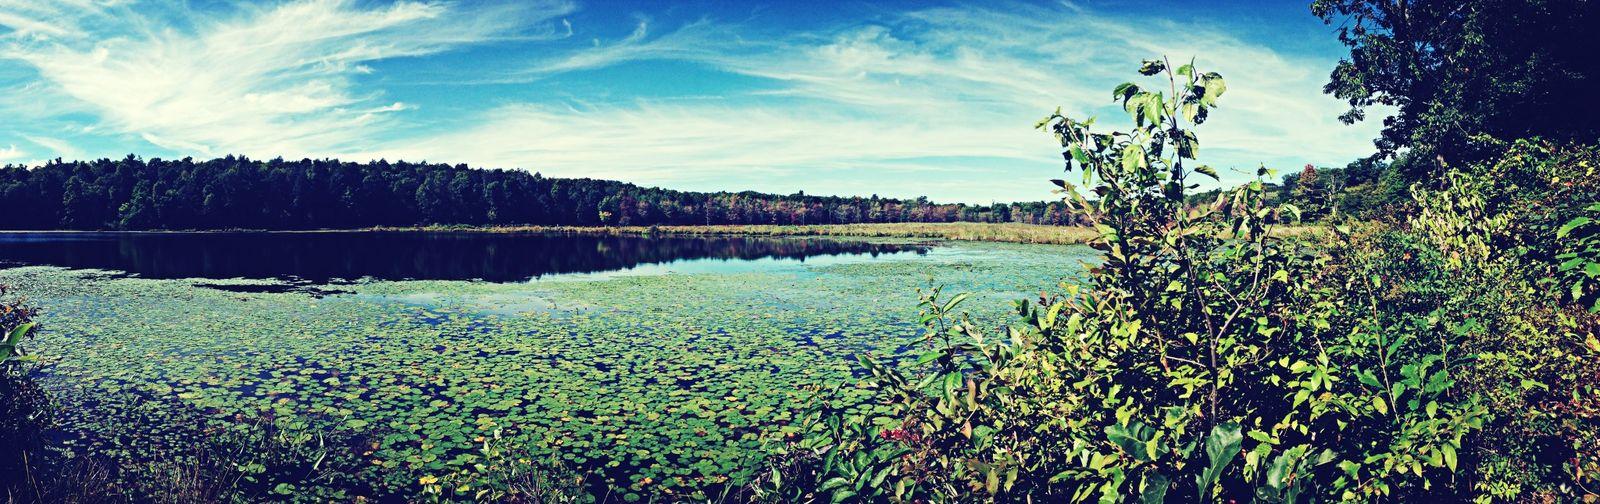 Nature Beautiful Landscape Earth